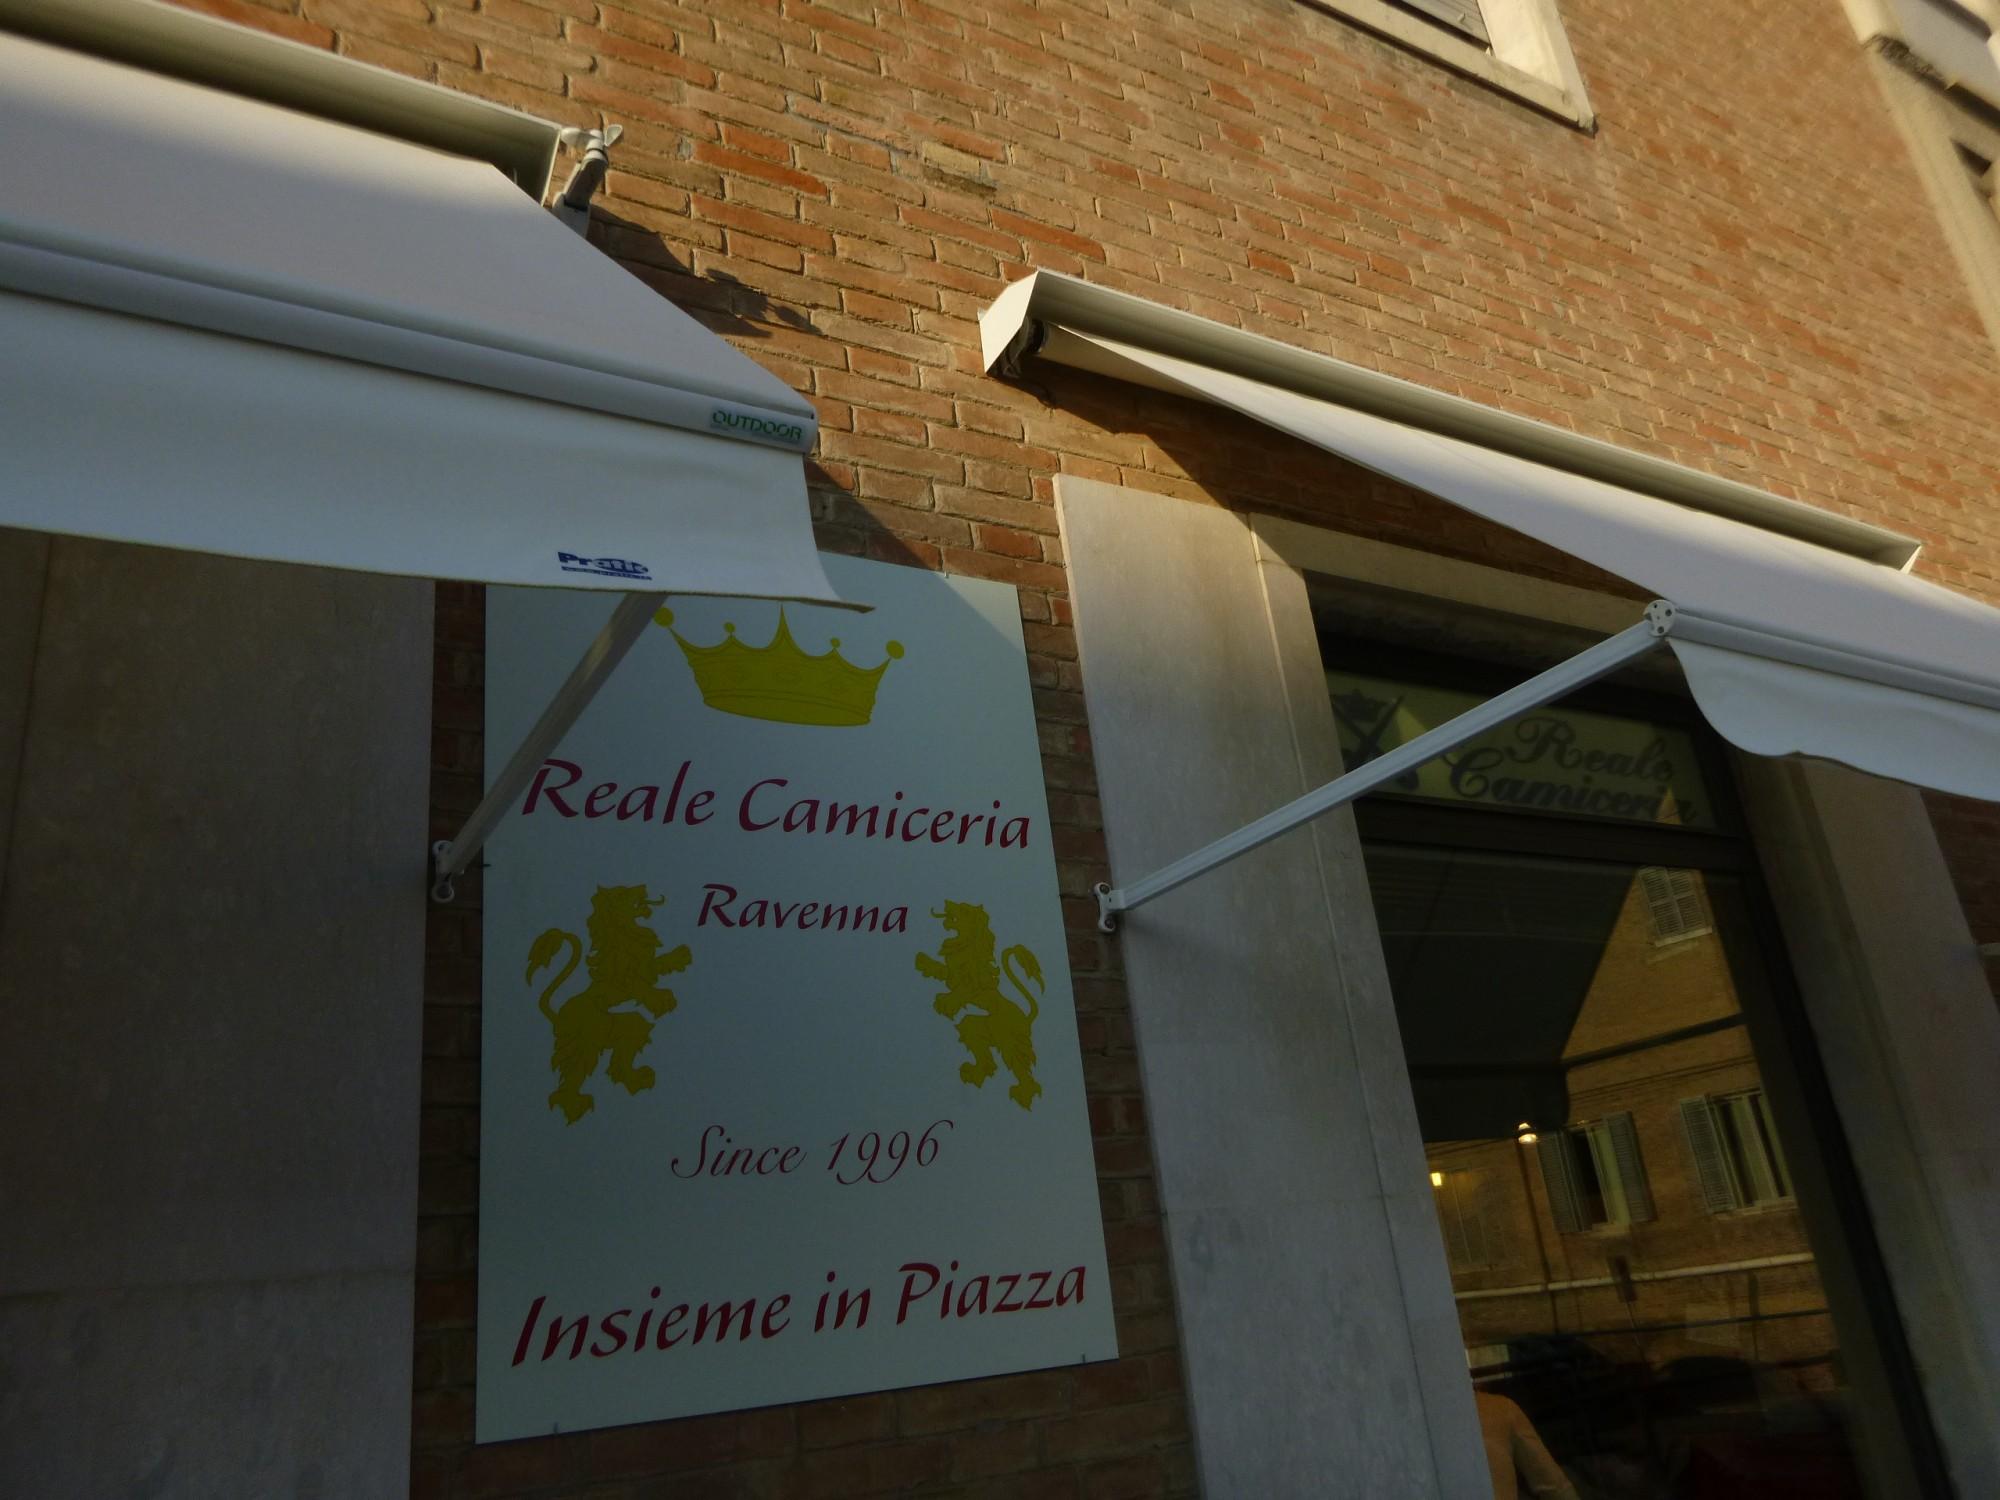 Boutique Reale Camiceria